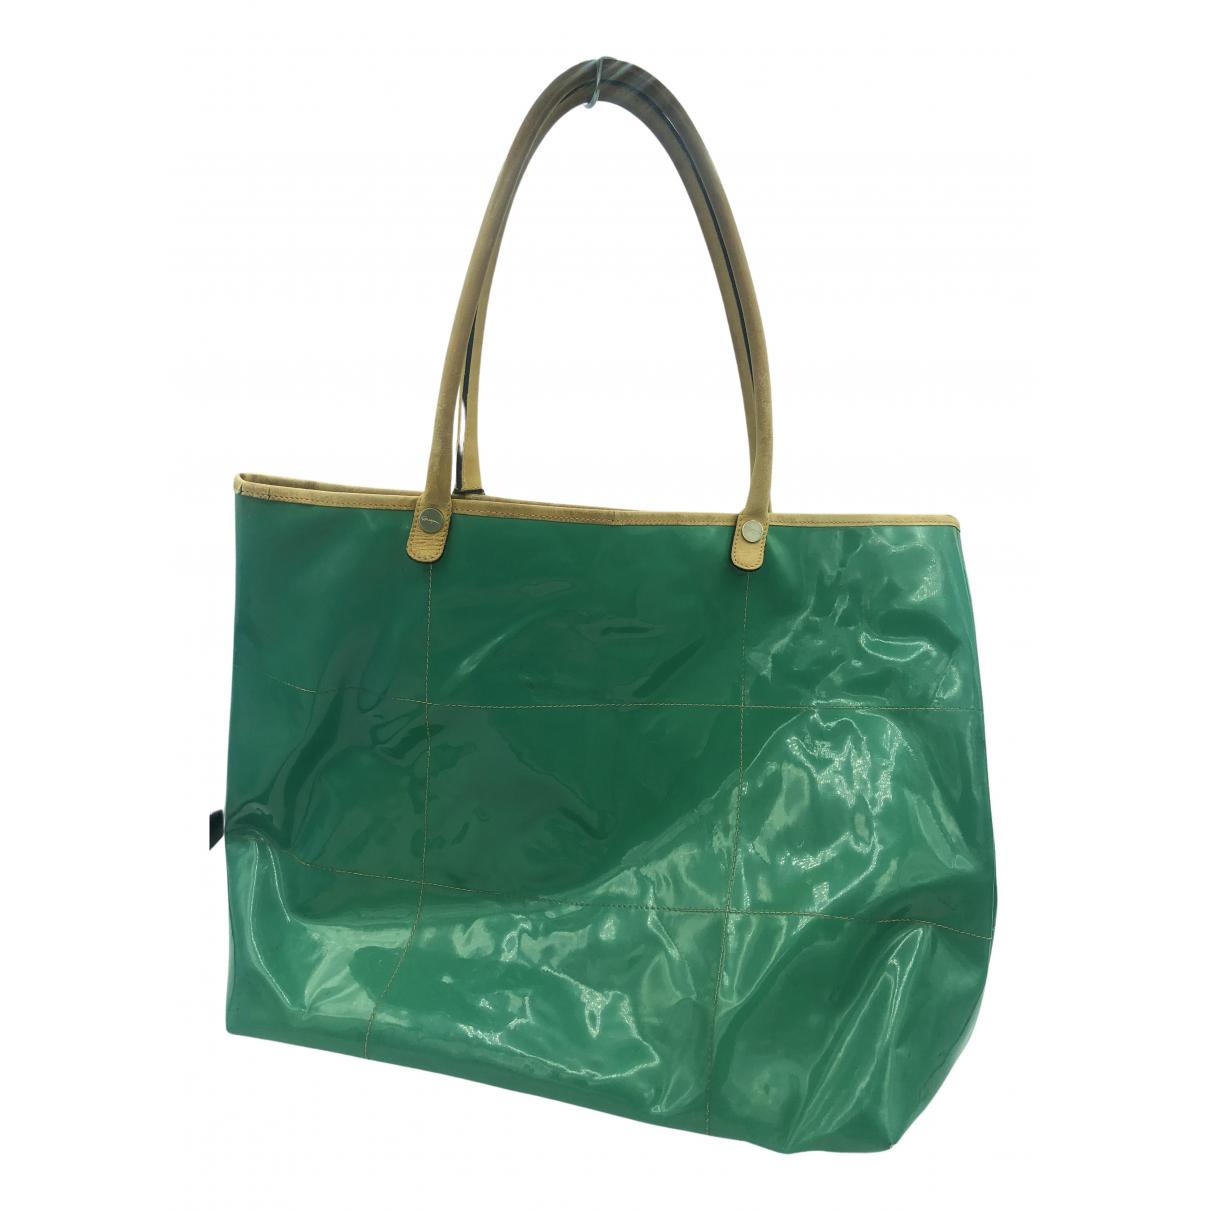 Salvatore Ferragamo N Green handbag for Women N